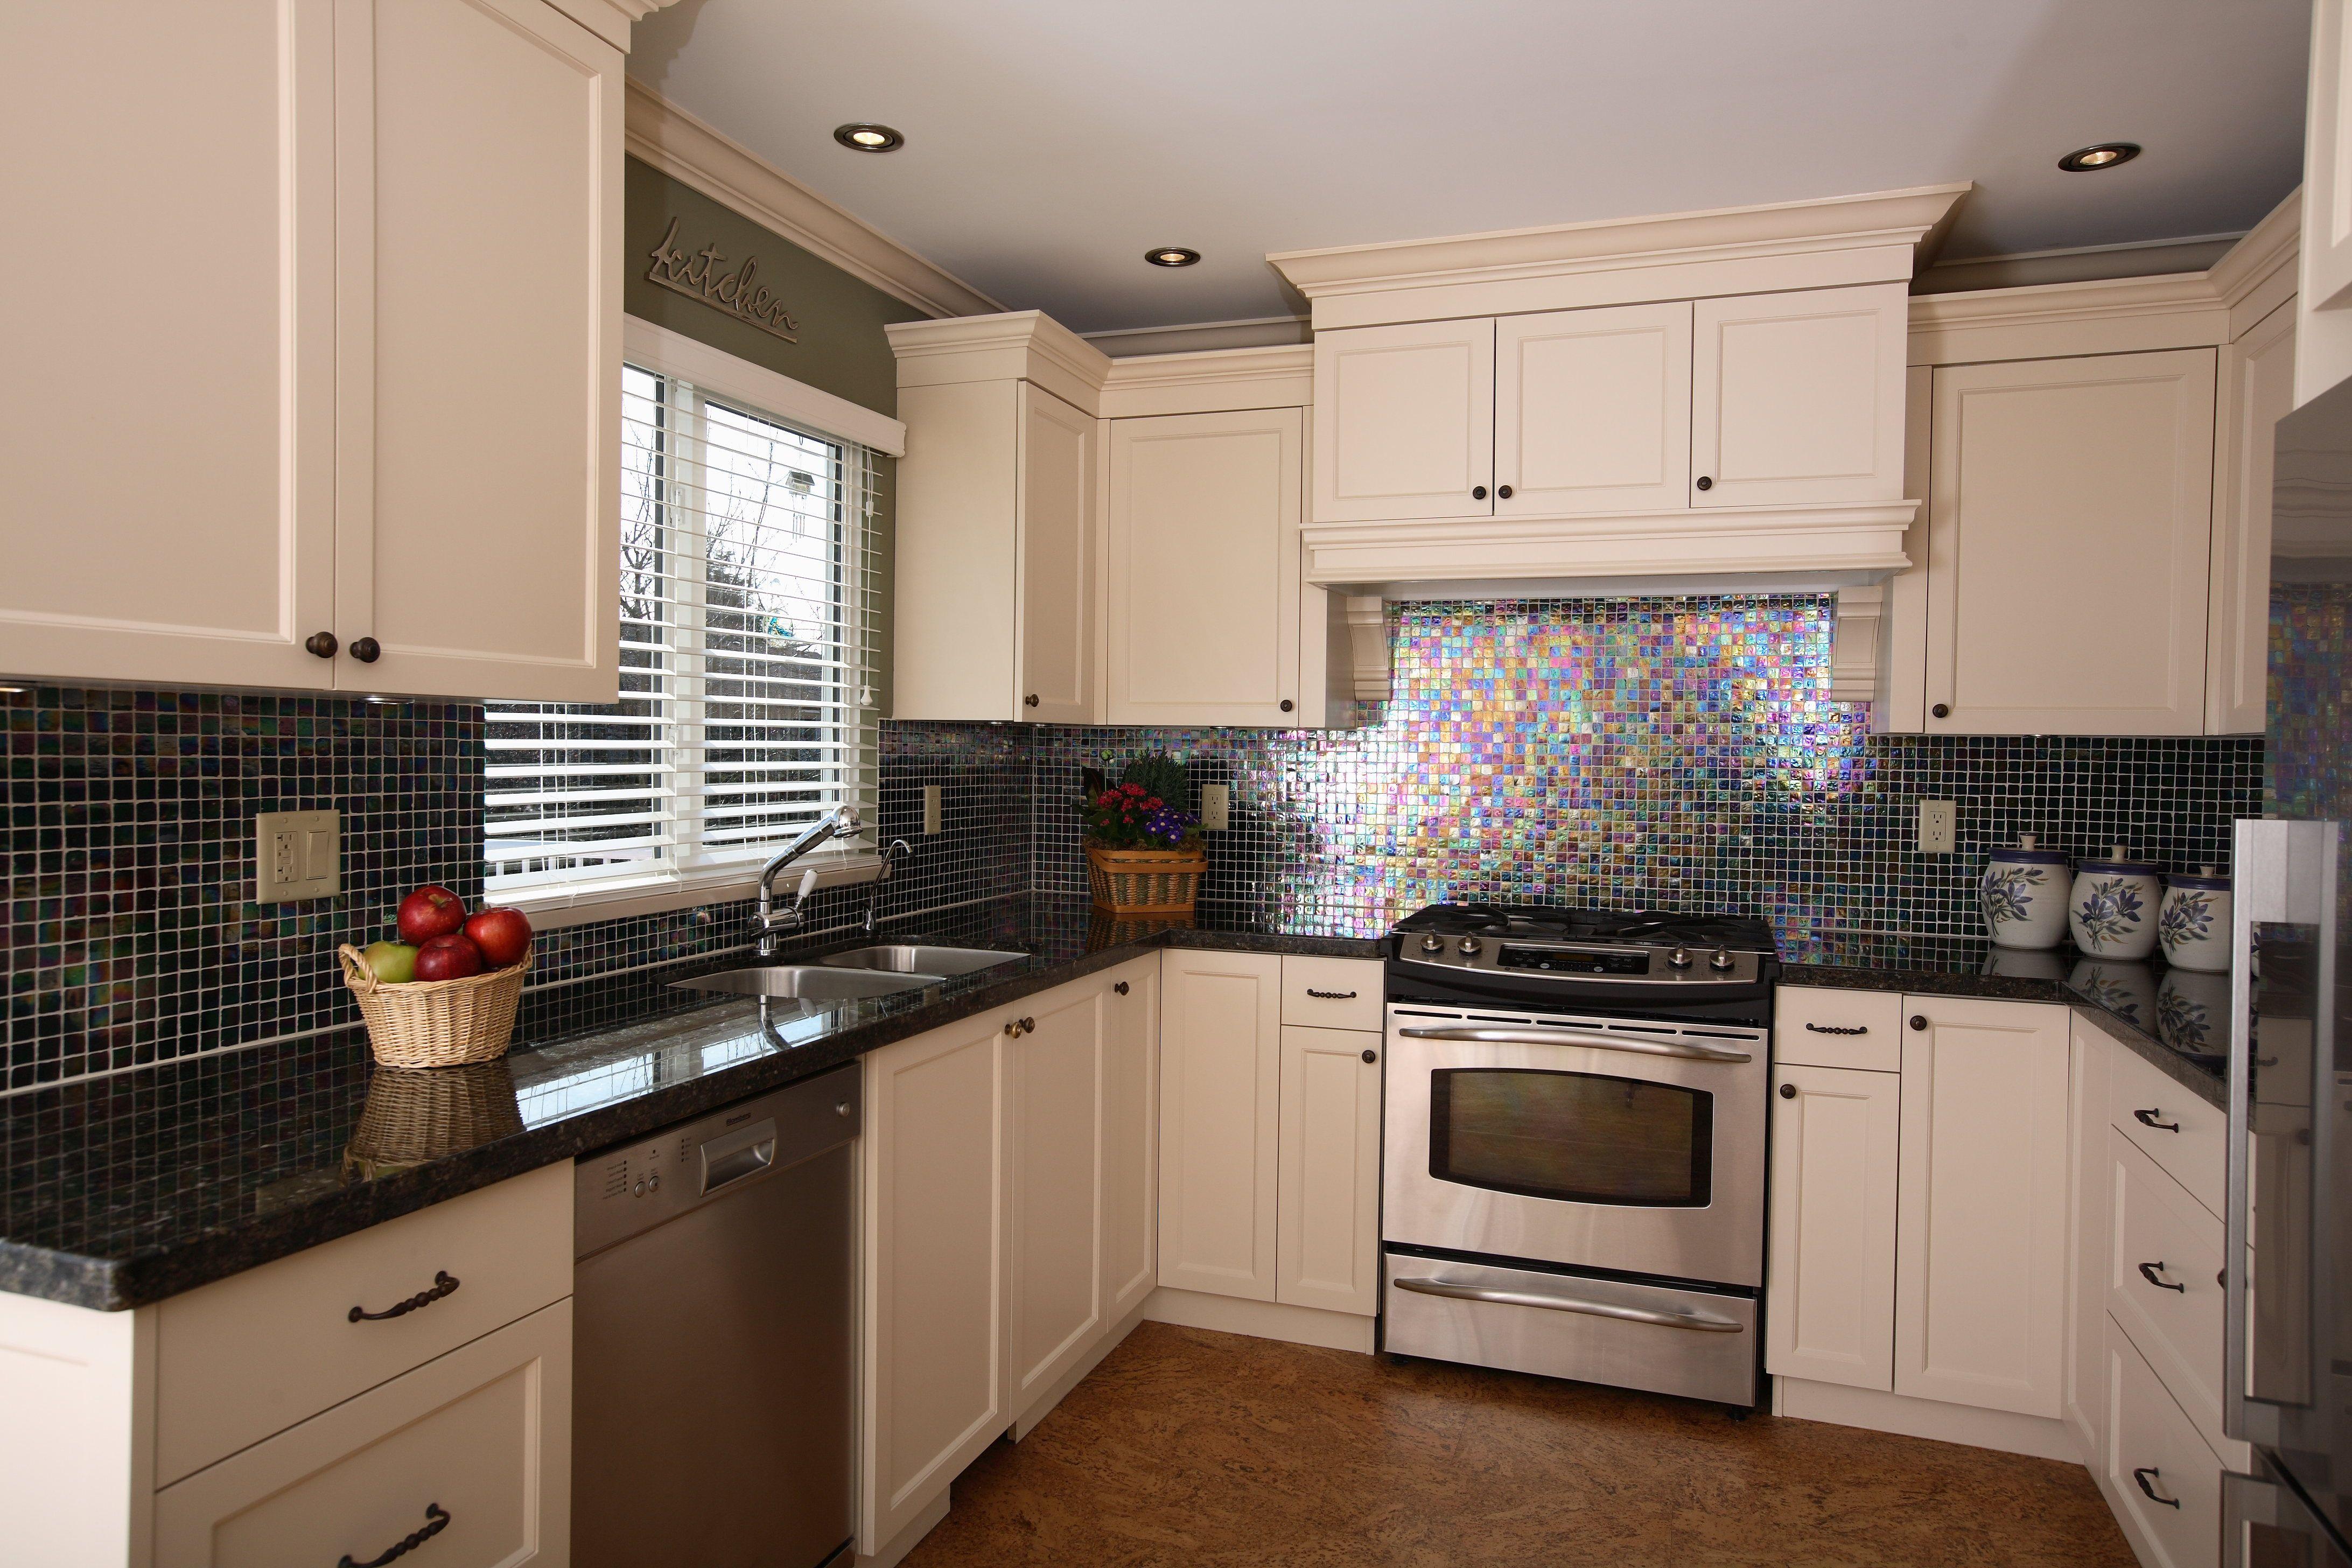 Luxkitchendesign1 4368×2912  House  Pinterest  Kitchen Delectable Kitchen Design Software Ikea Design Inspiration